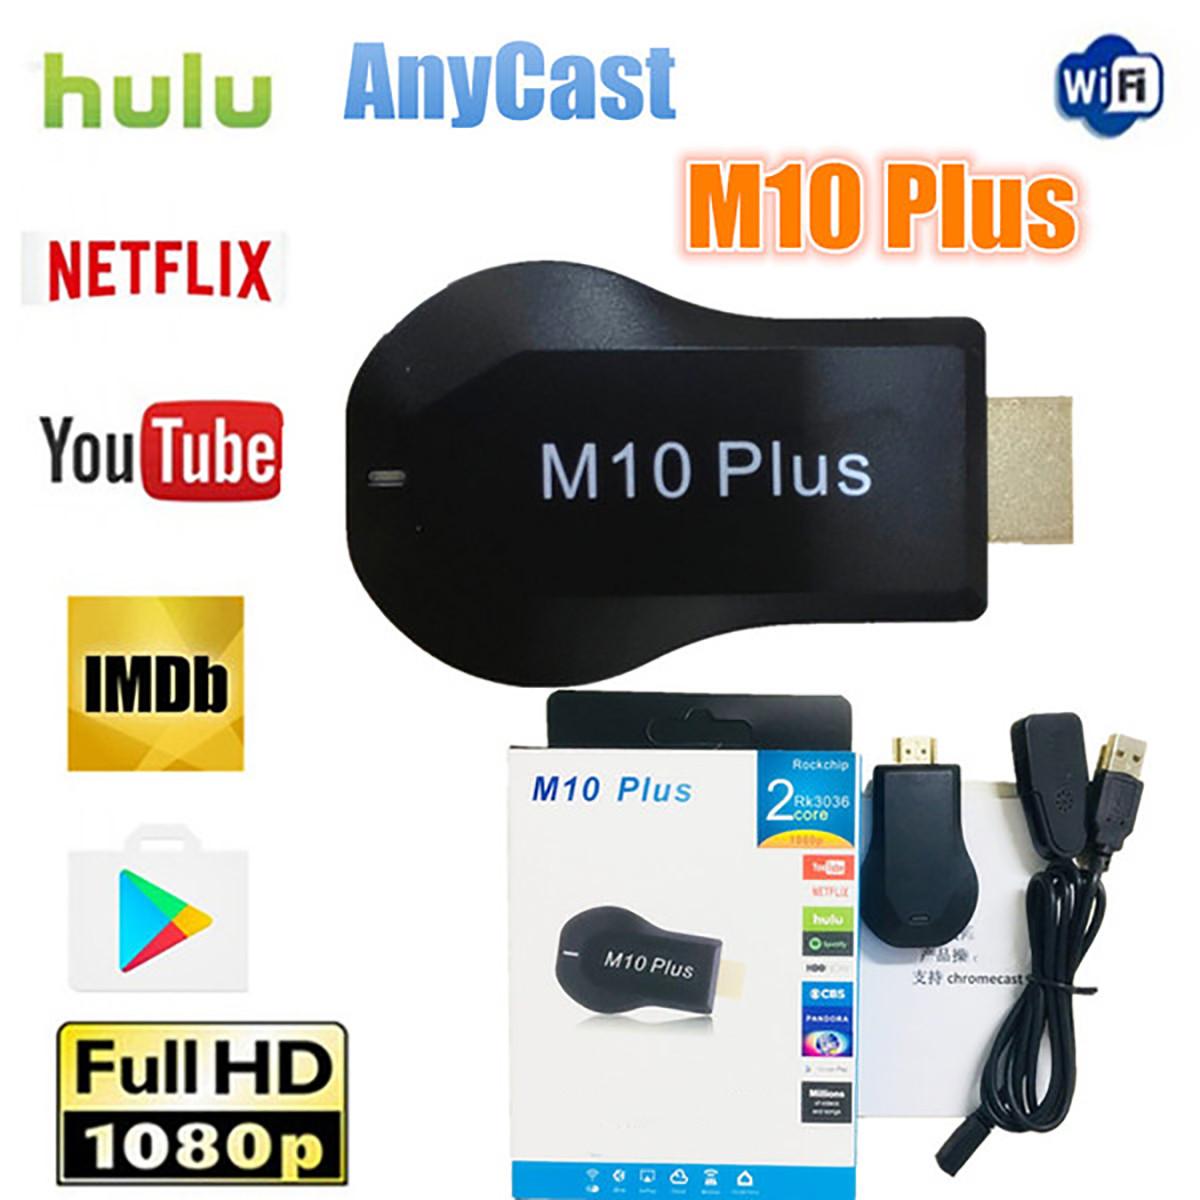 Anycast адаптер для подключения Wi-Fi